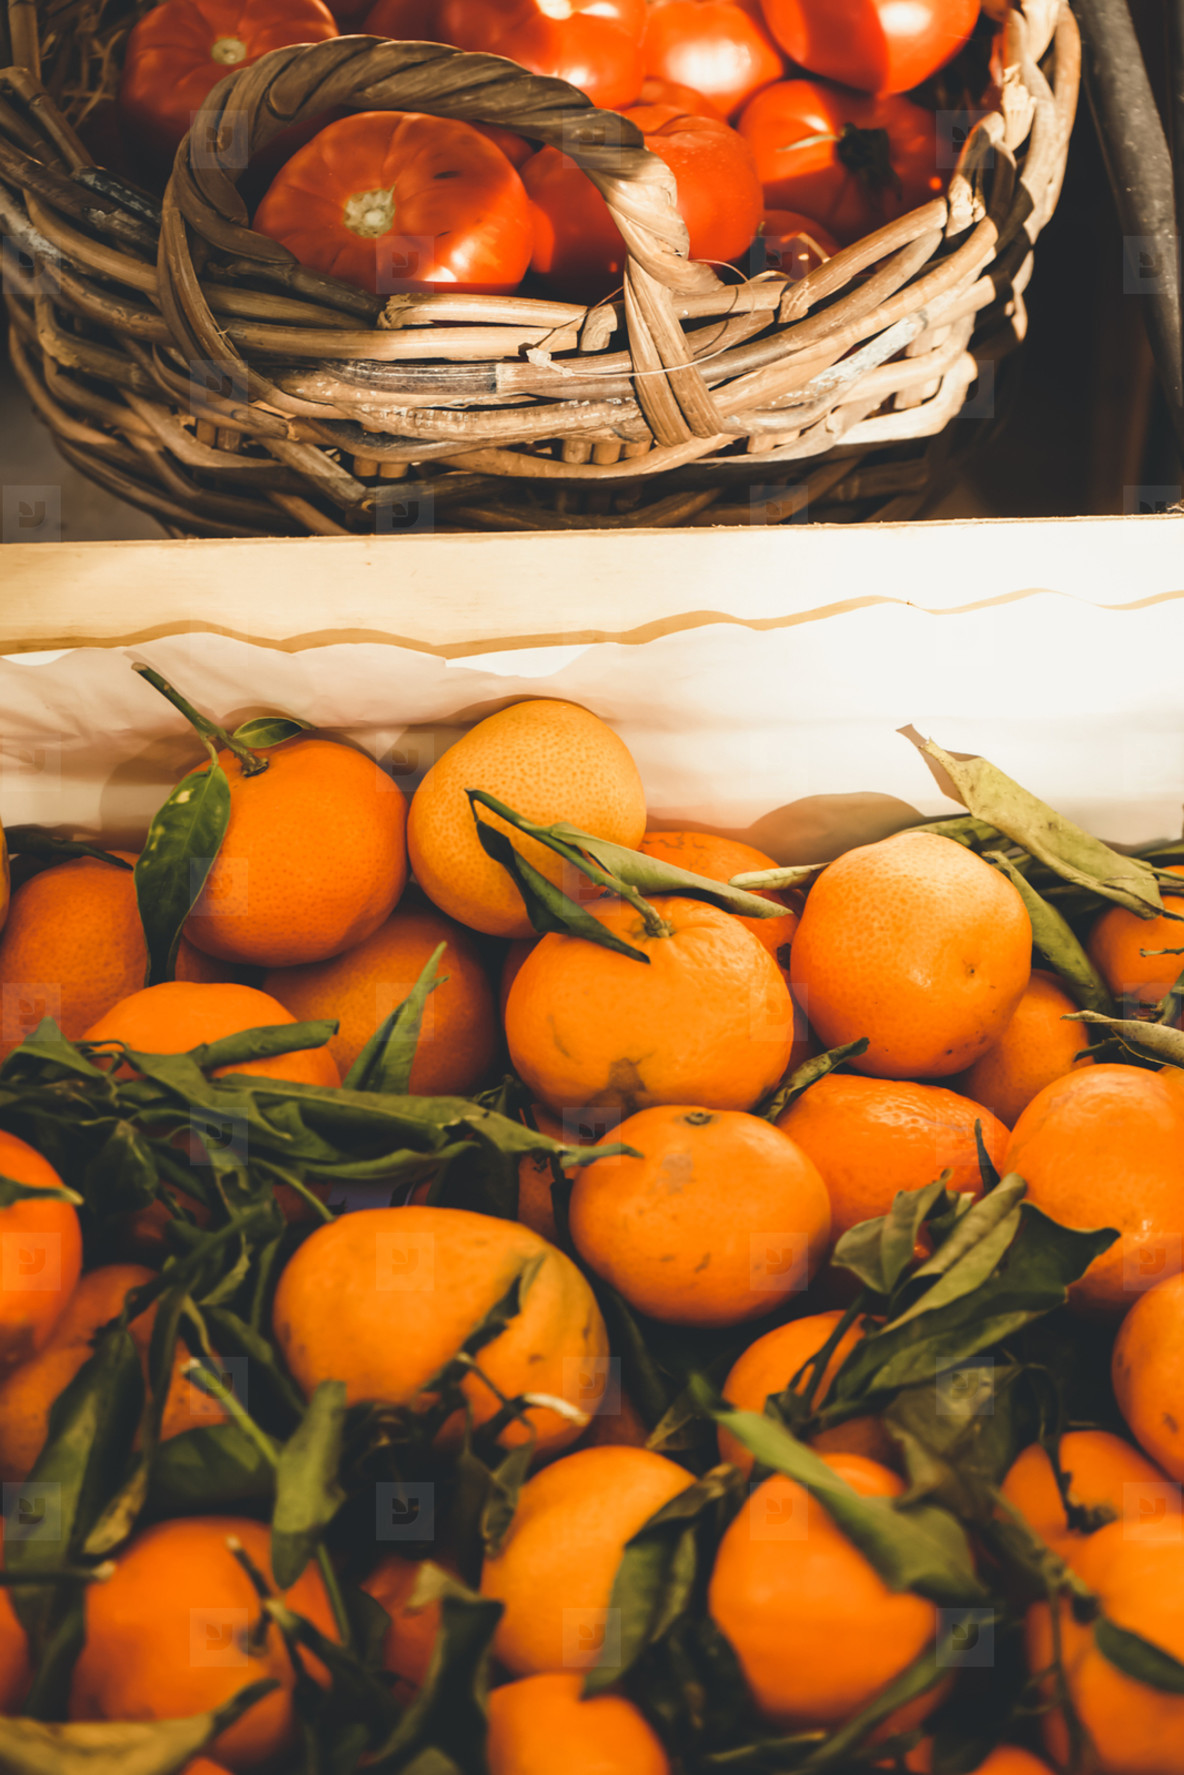 Valencia  Spain  delicious seasonal clementines